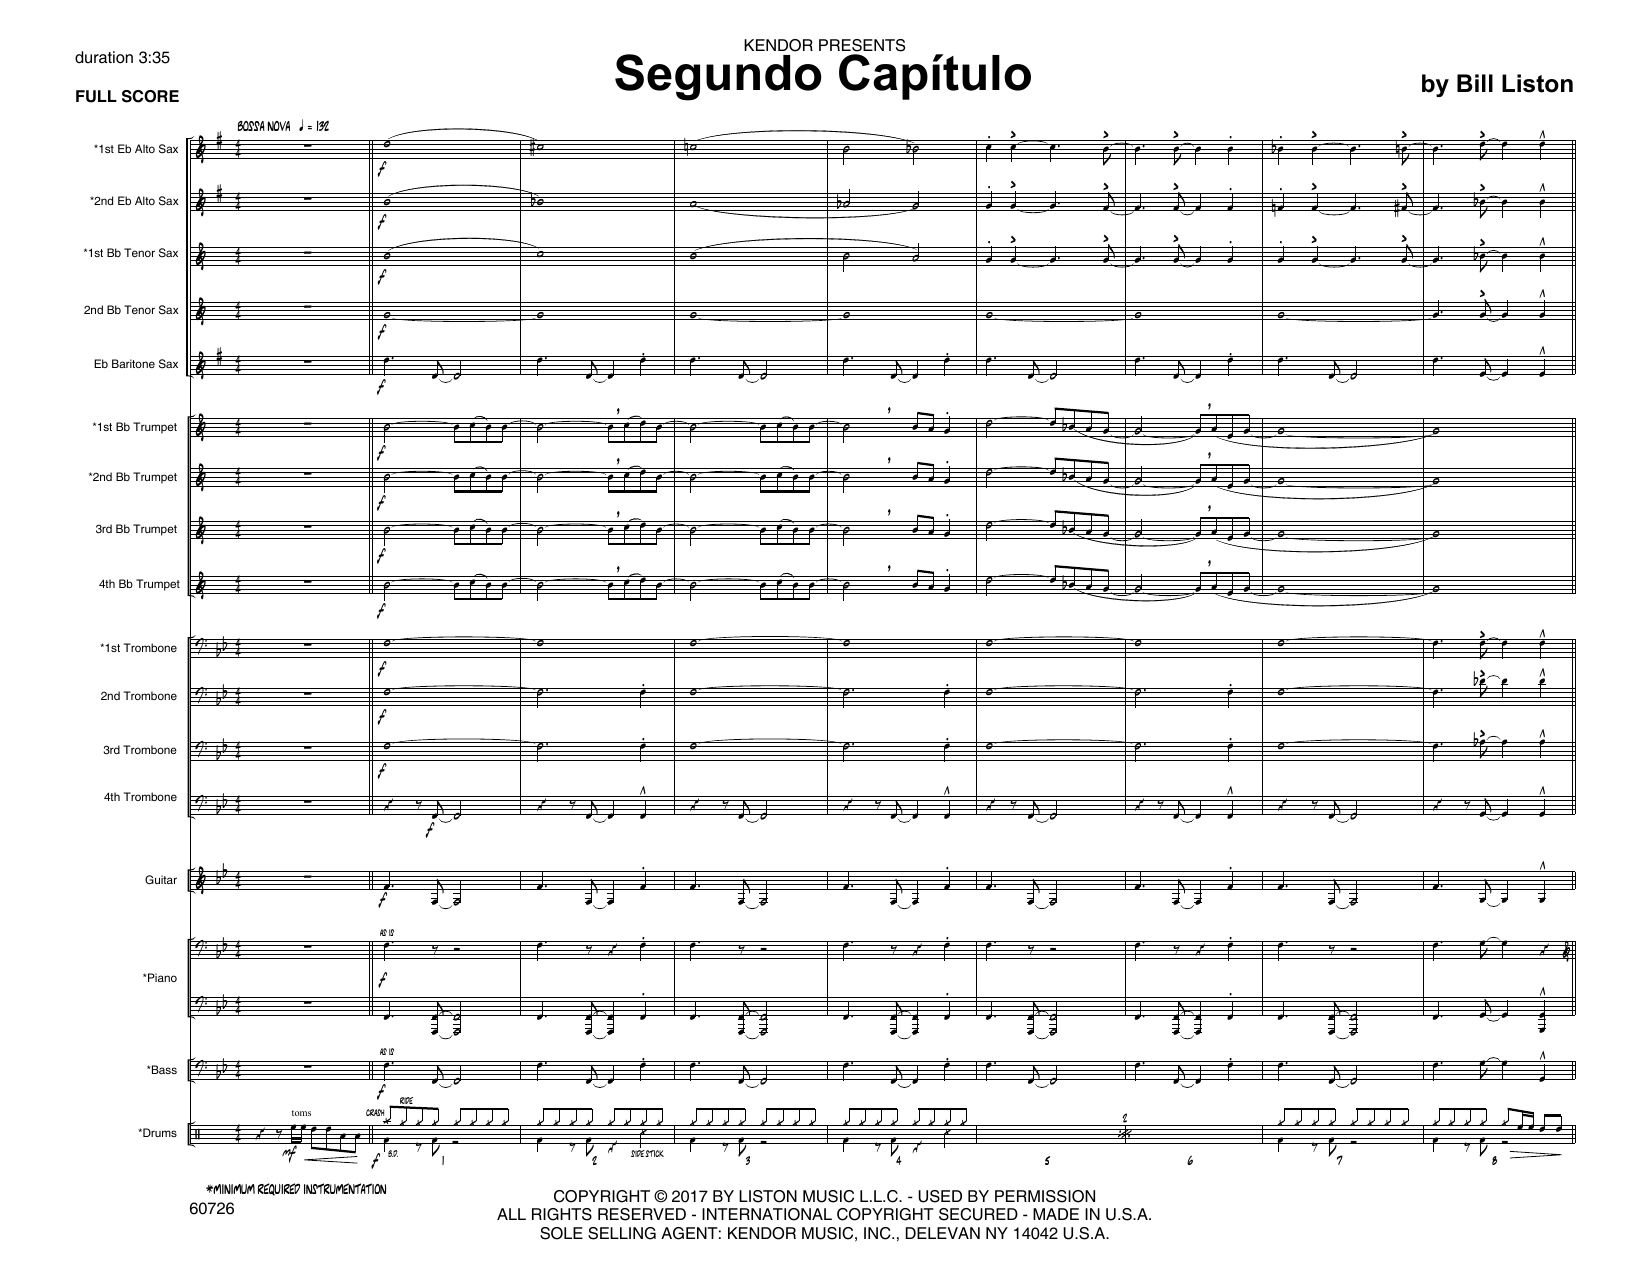 Bill Liston Segundo Capitulo - Full Score sheet music notes printable PDF score